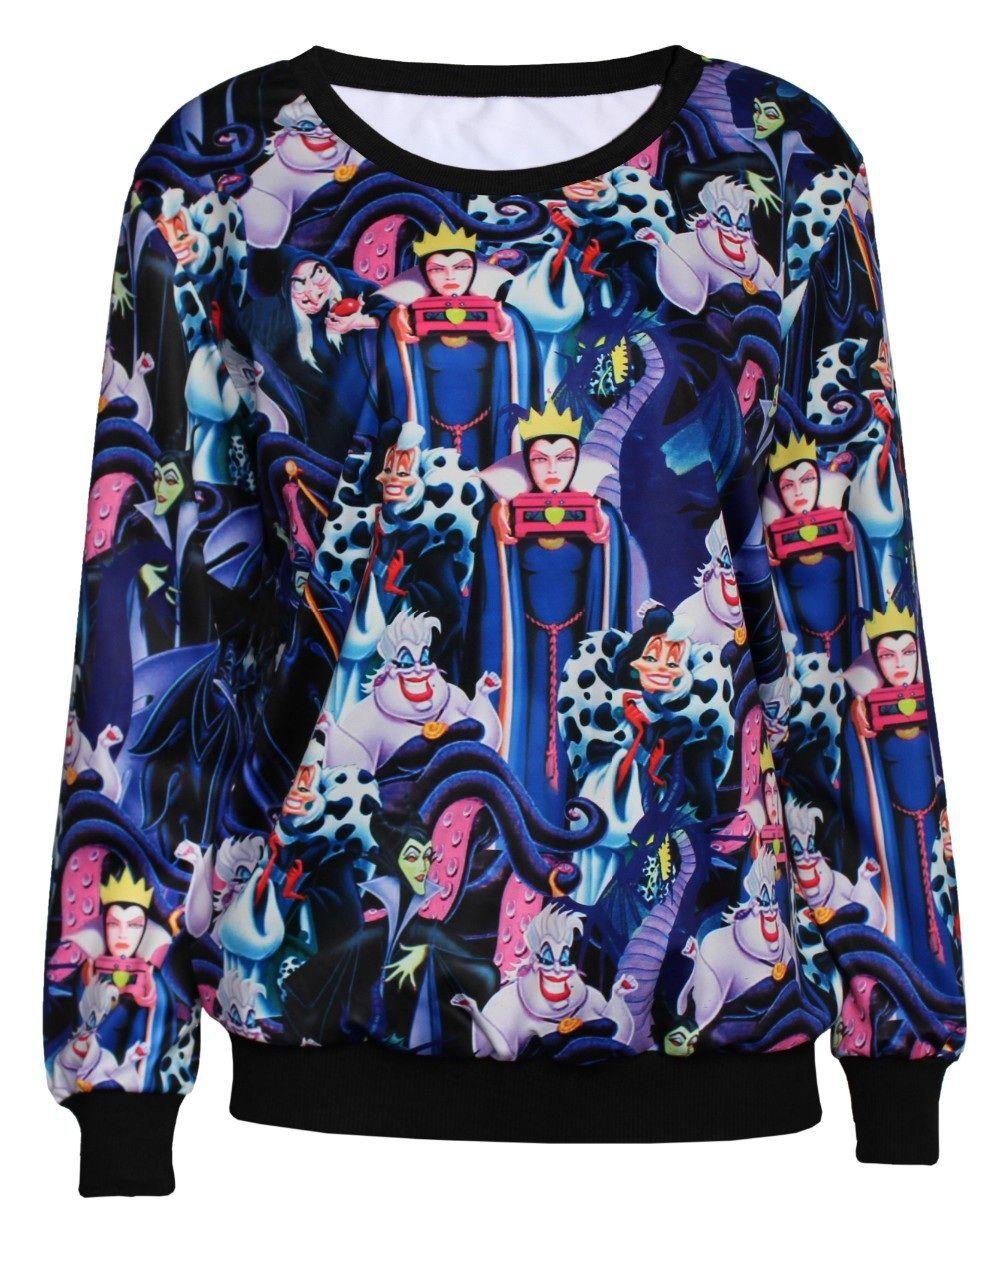 d38477c7a7066 disney villains sweatshirt - Google Search